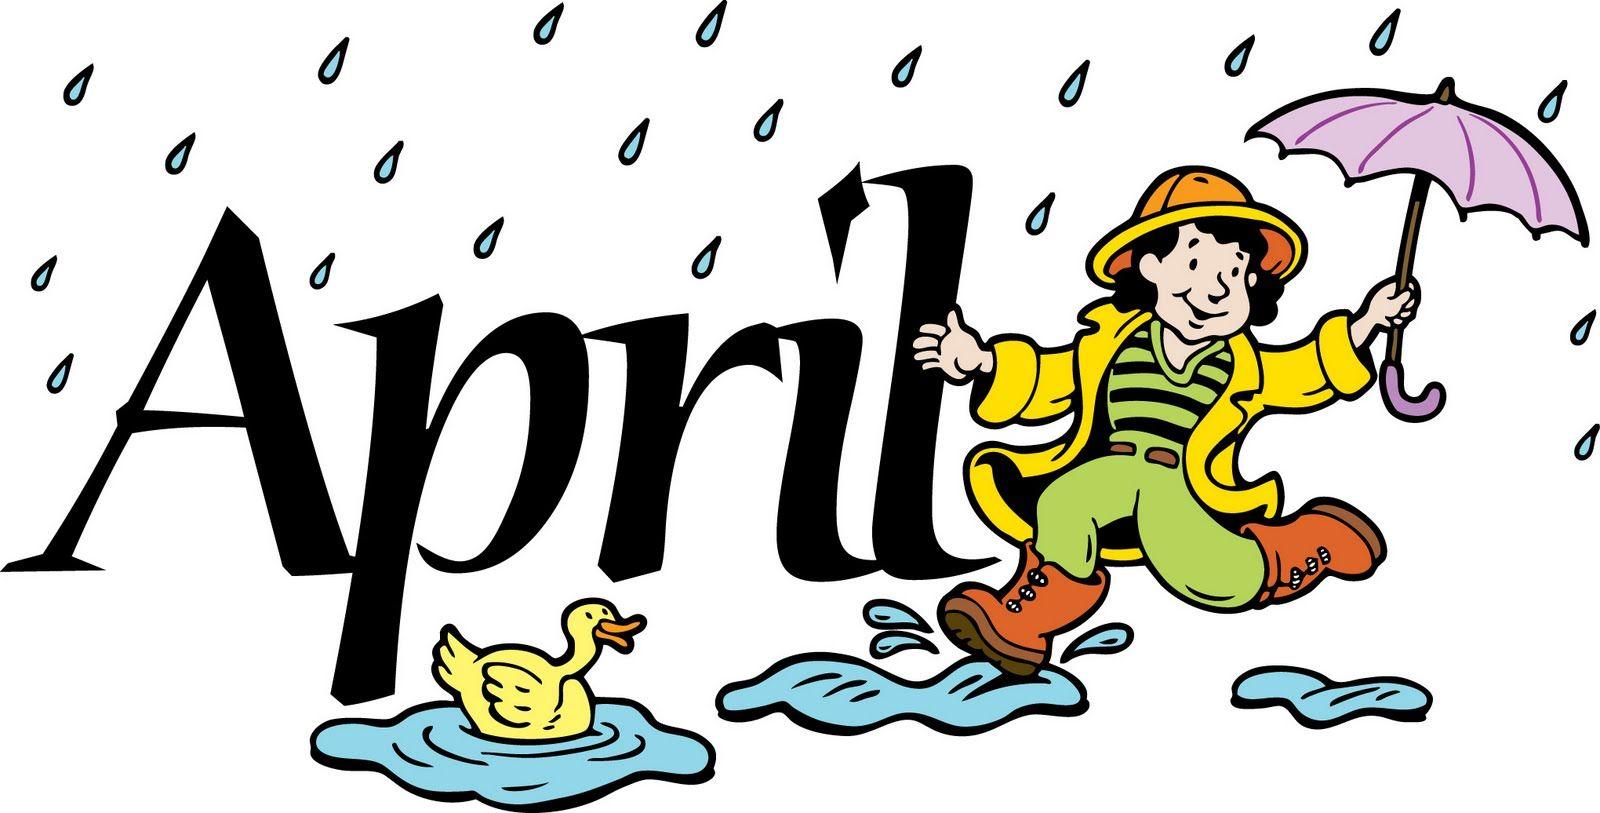 Free month of april clip art clipart image.